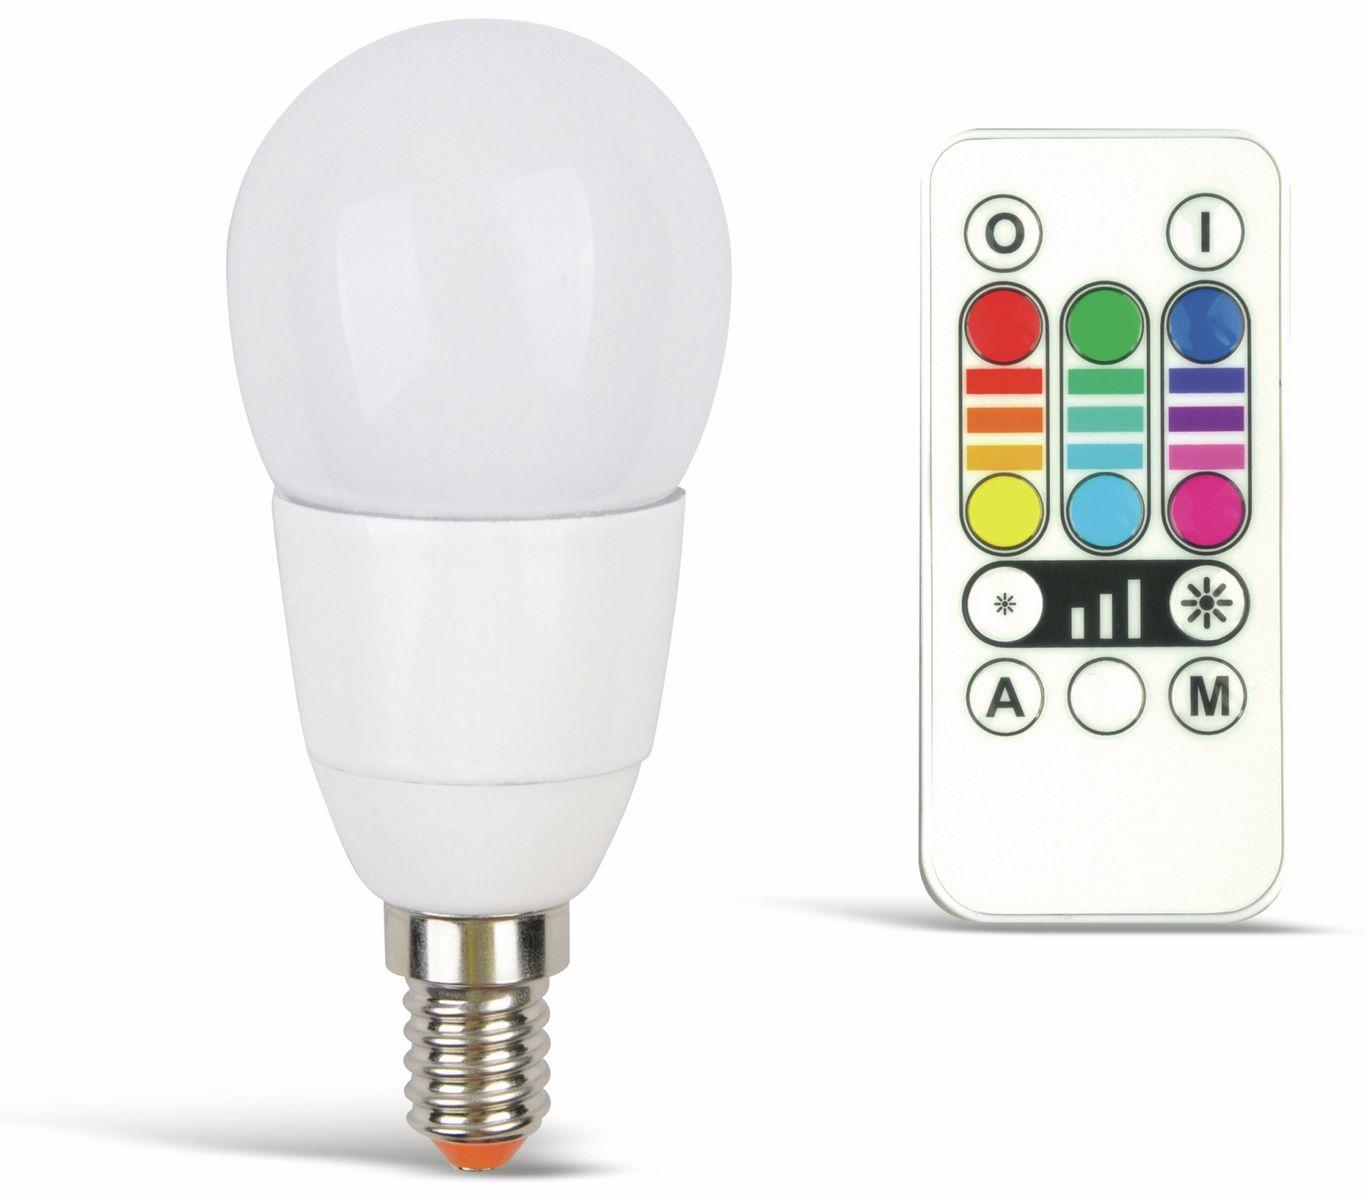 rgb led lampada con telecomando jedi lighting e14 eek b 3 2 w led lampada ebay. Black Bedroom Furniture Sets. Home Design Ideas